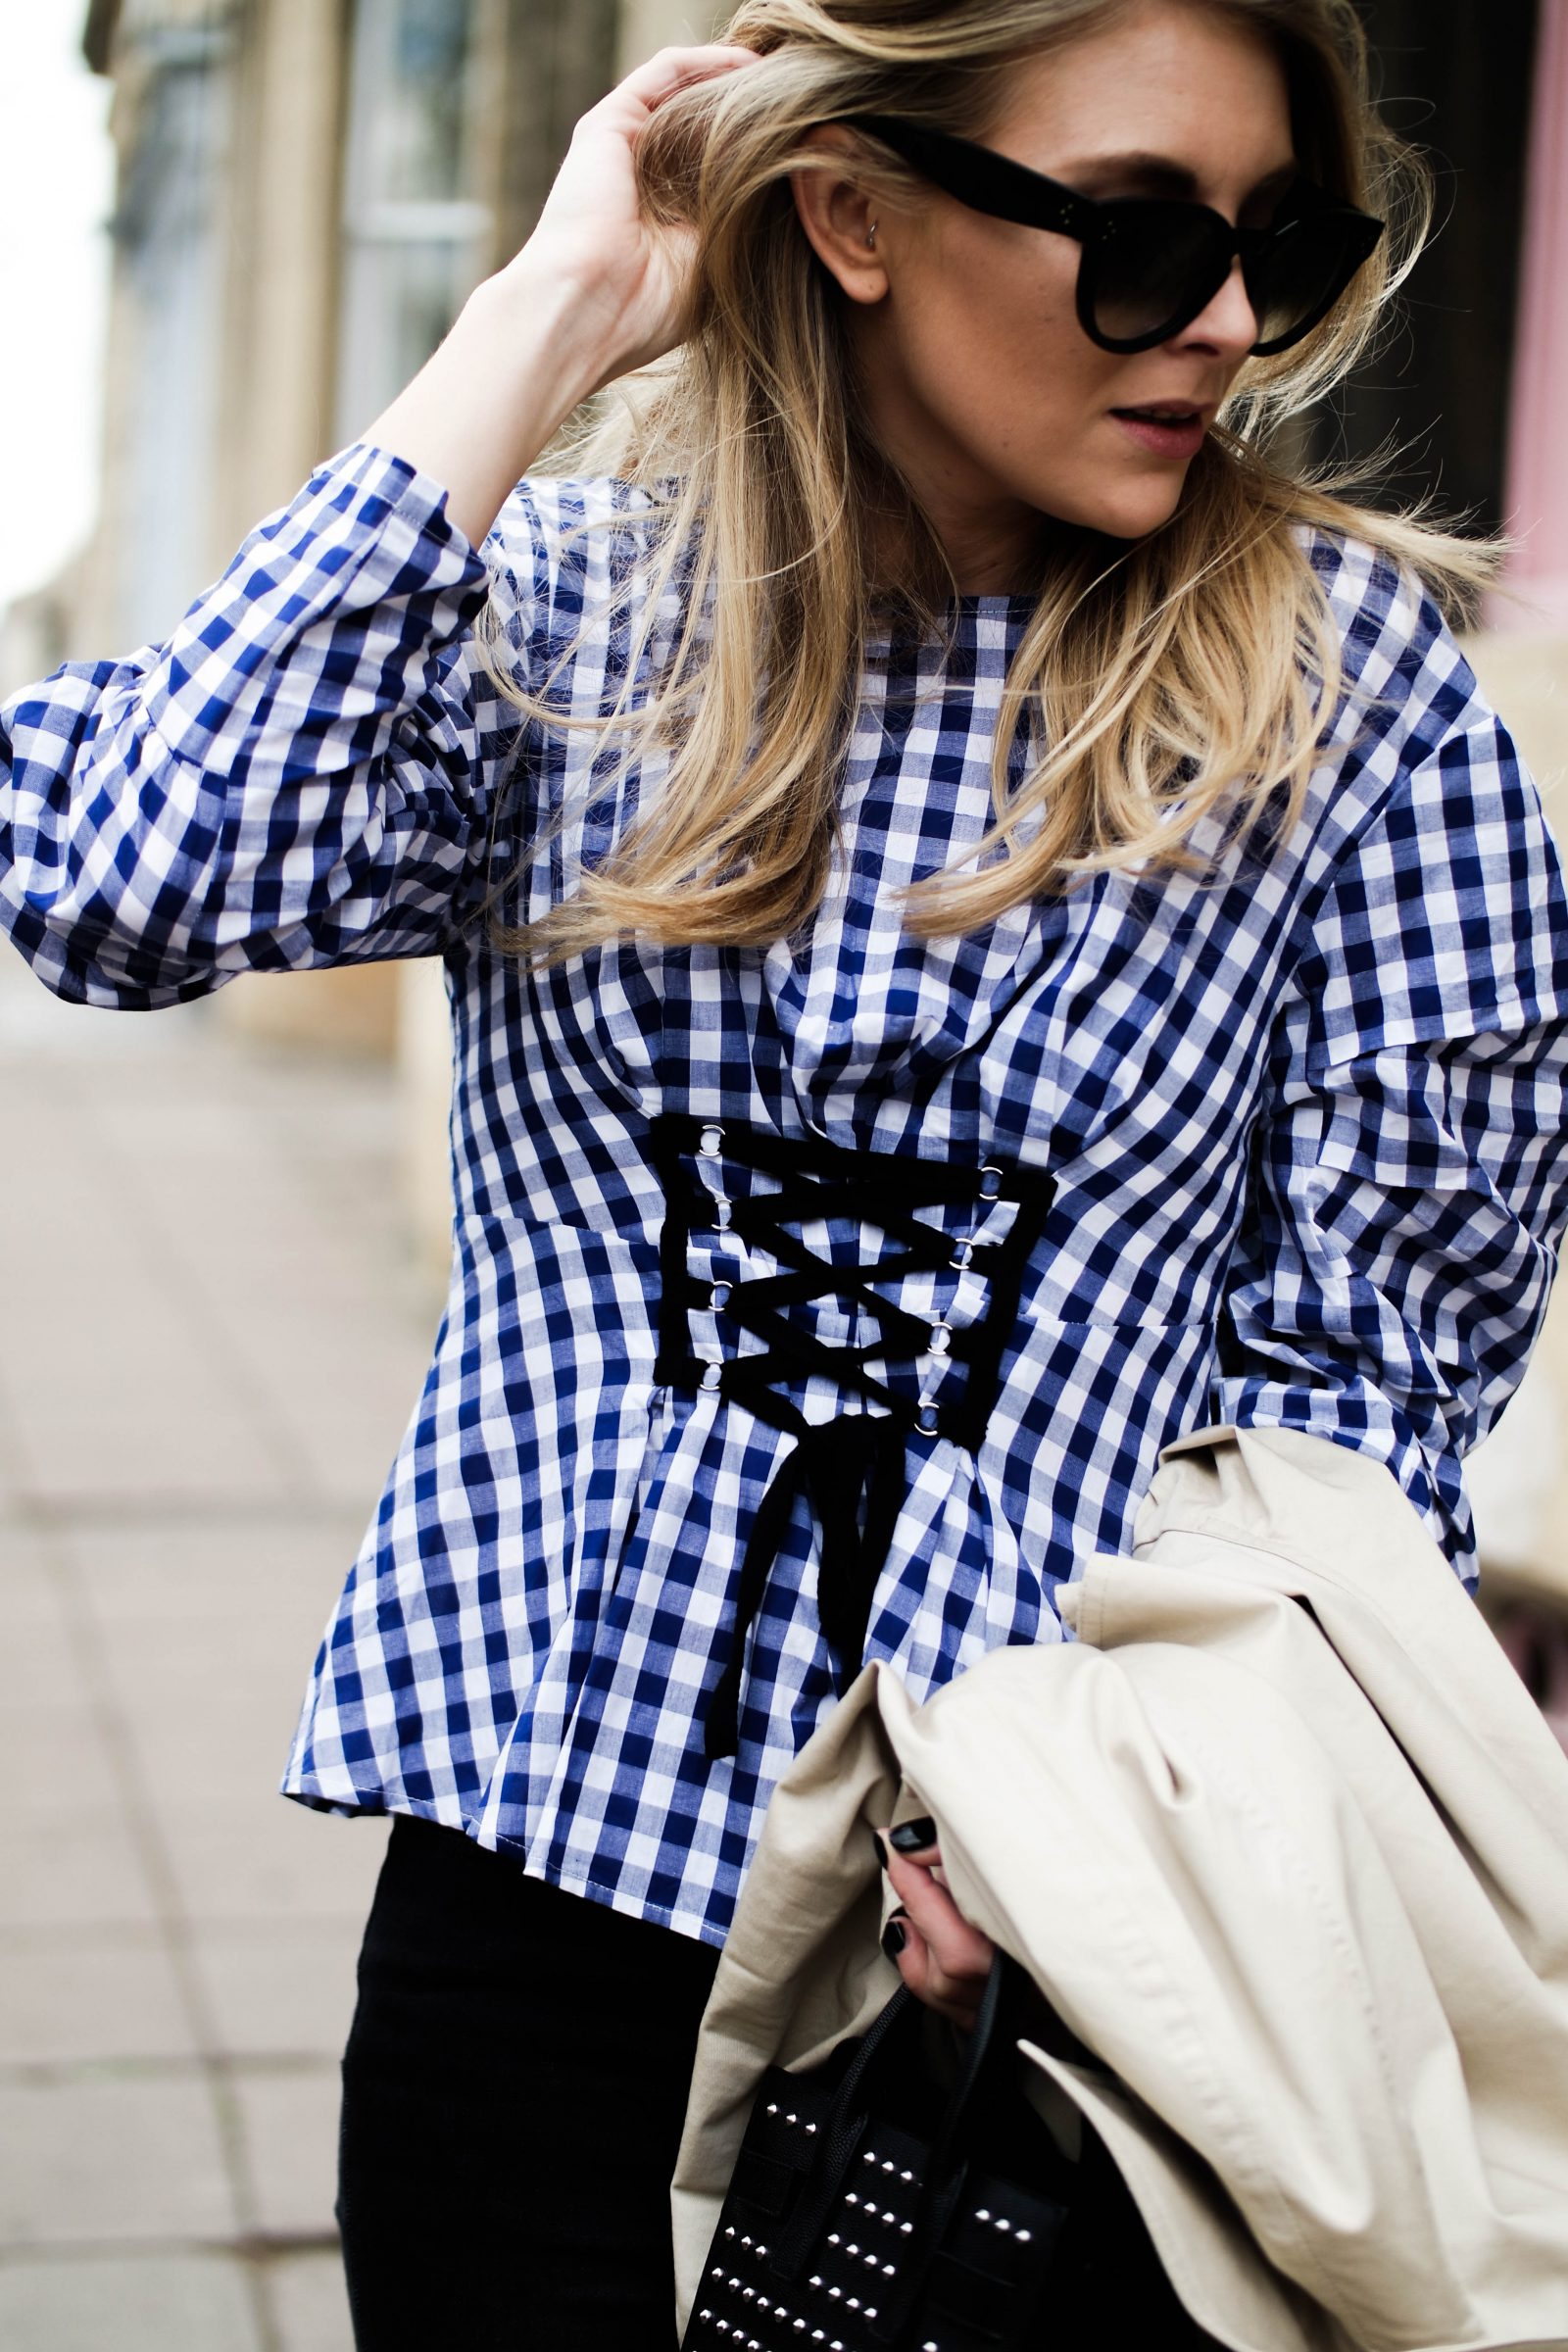 5 Ways To Wear The Corset Trend - Gingham Corset Top